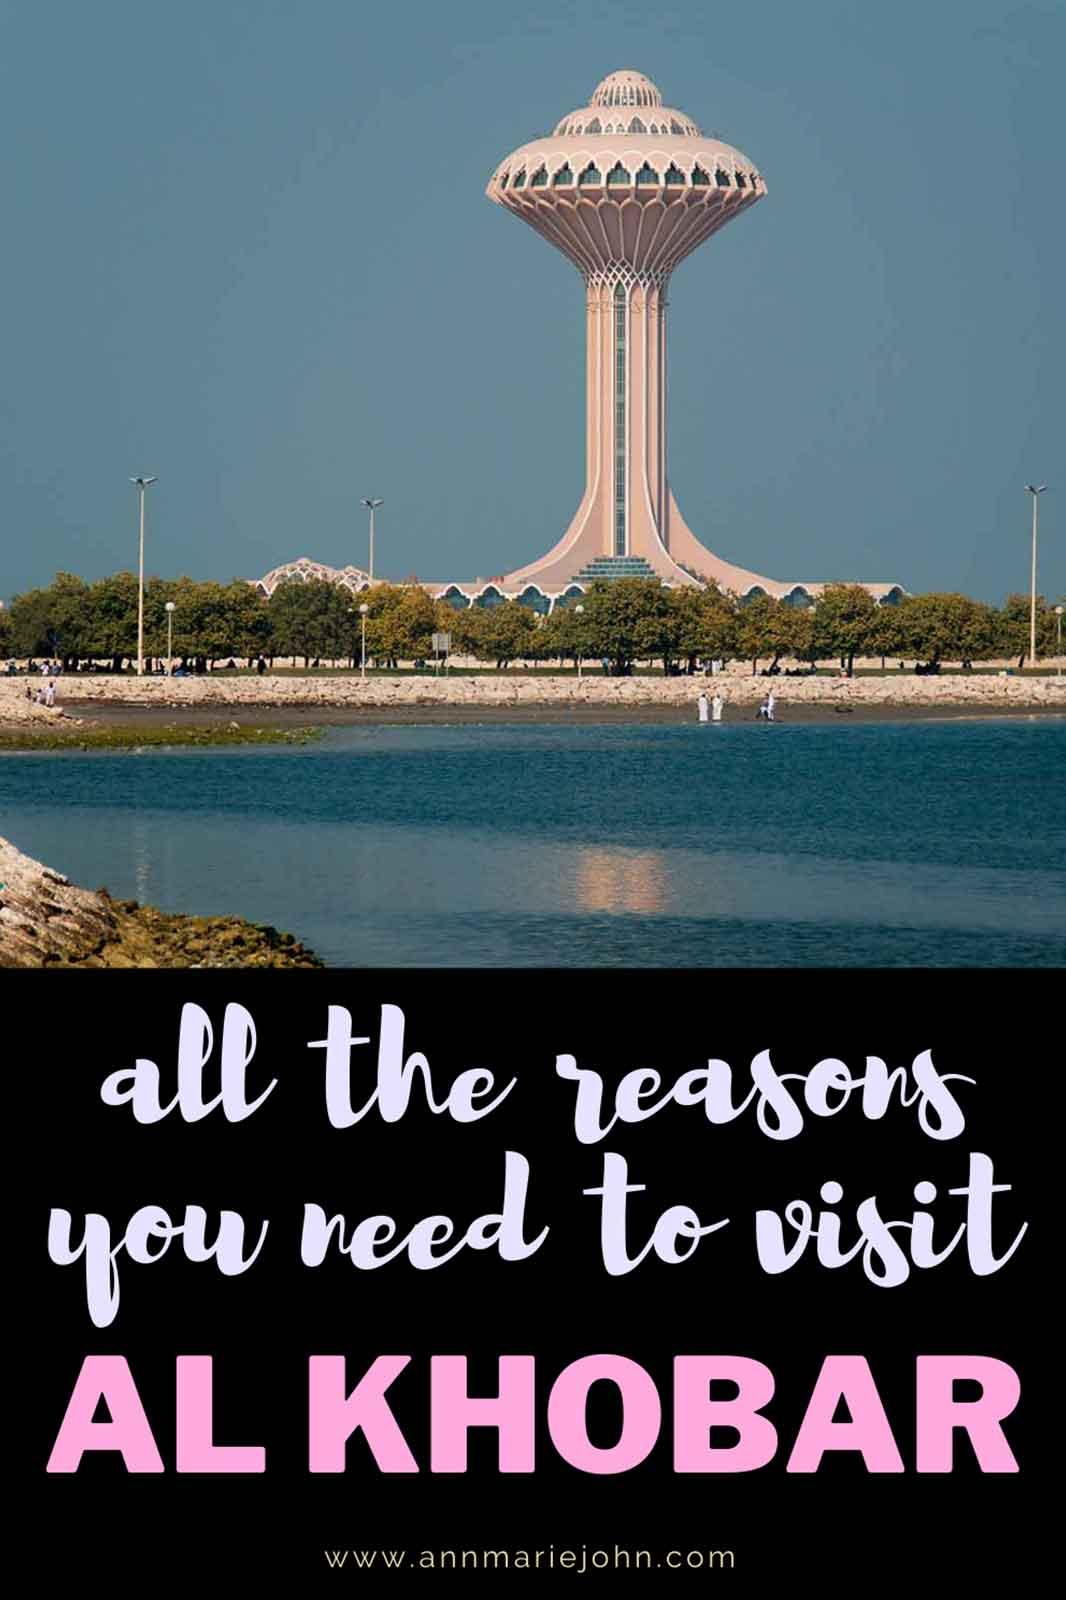 Reasons To Make Al Khobar Your Next Vacation Destination